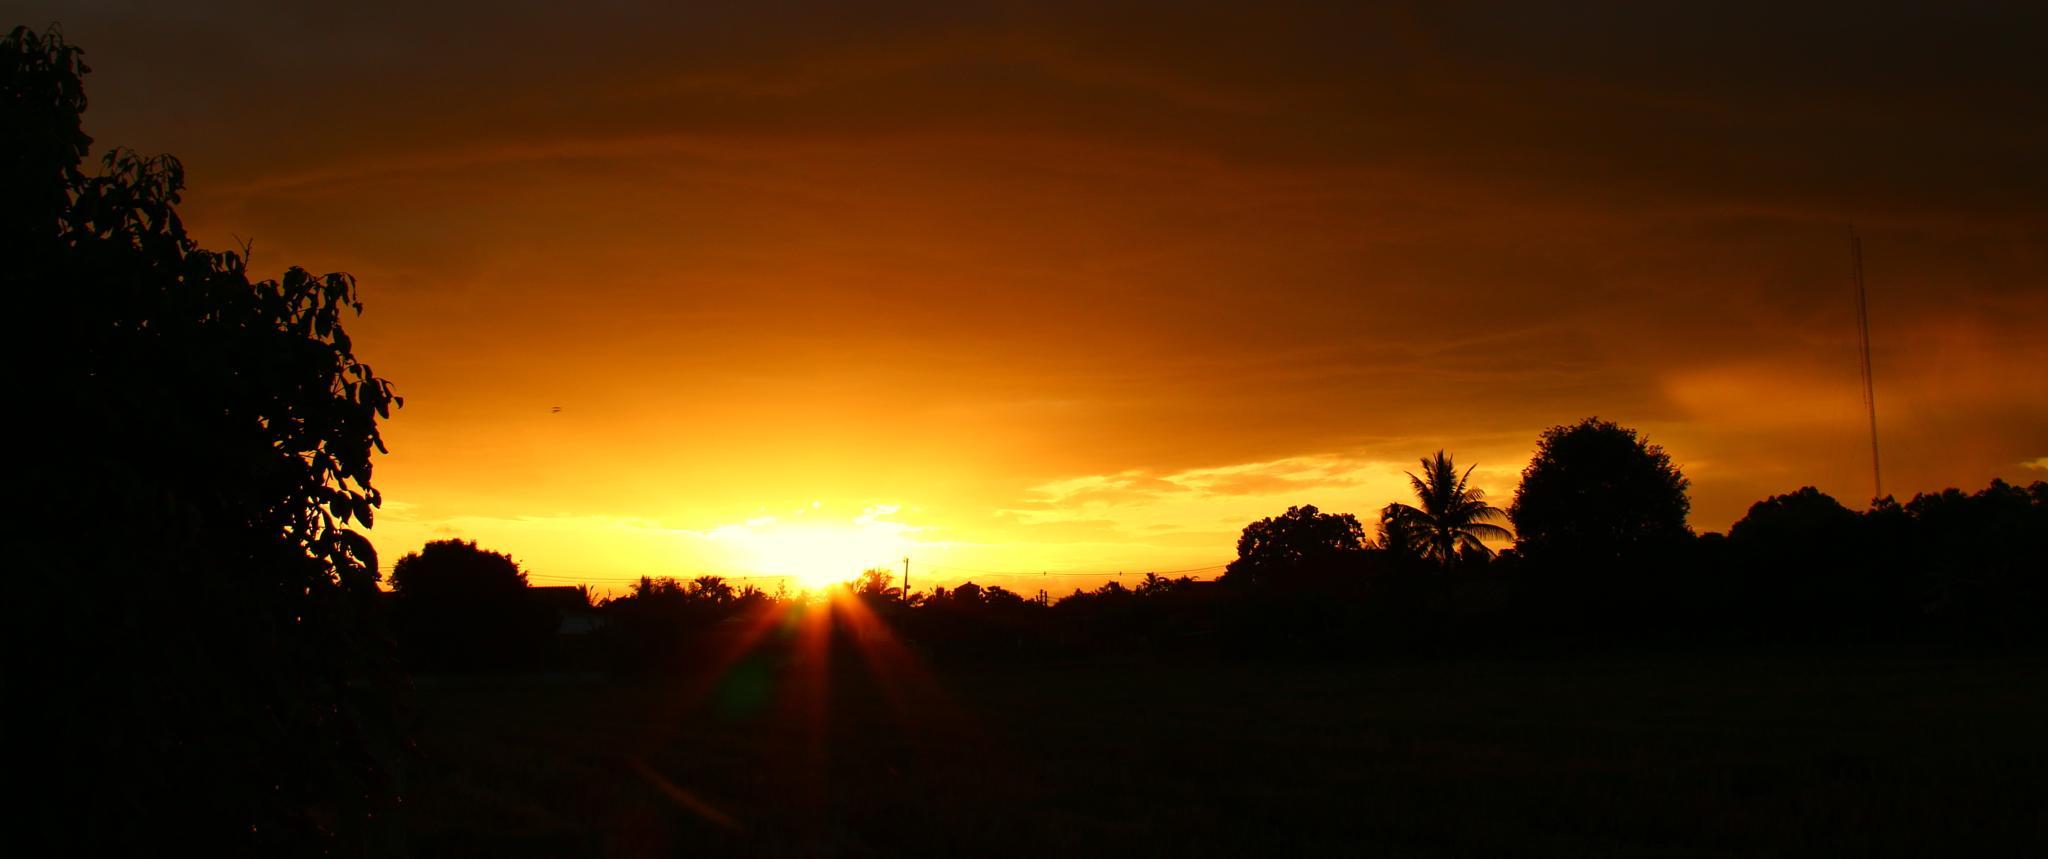 Sunset by Michael Mettier